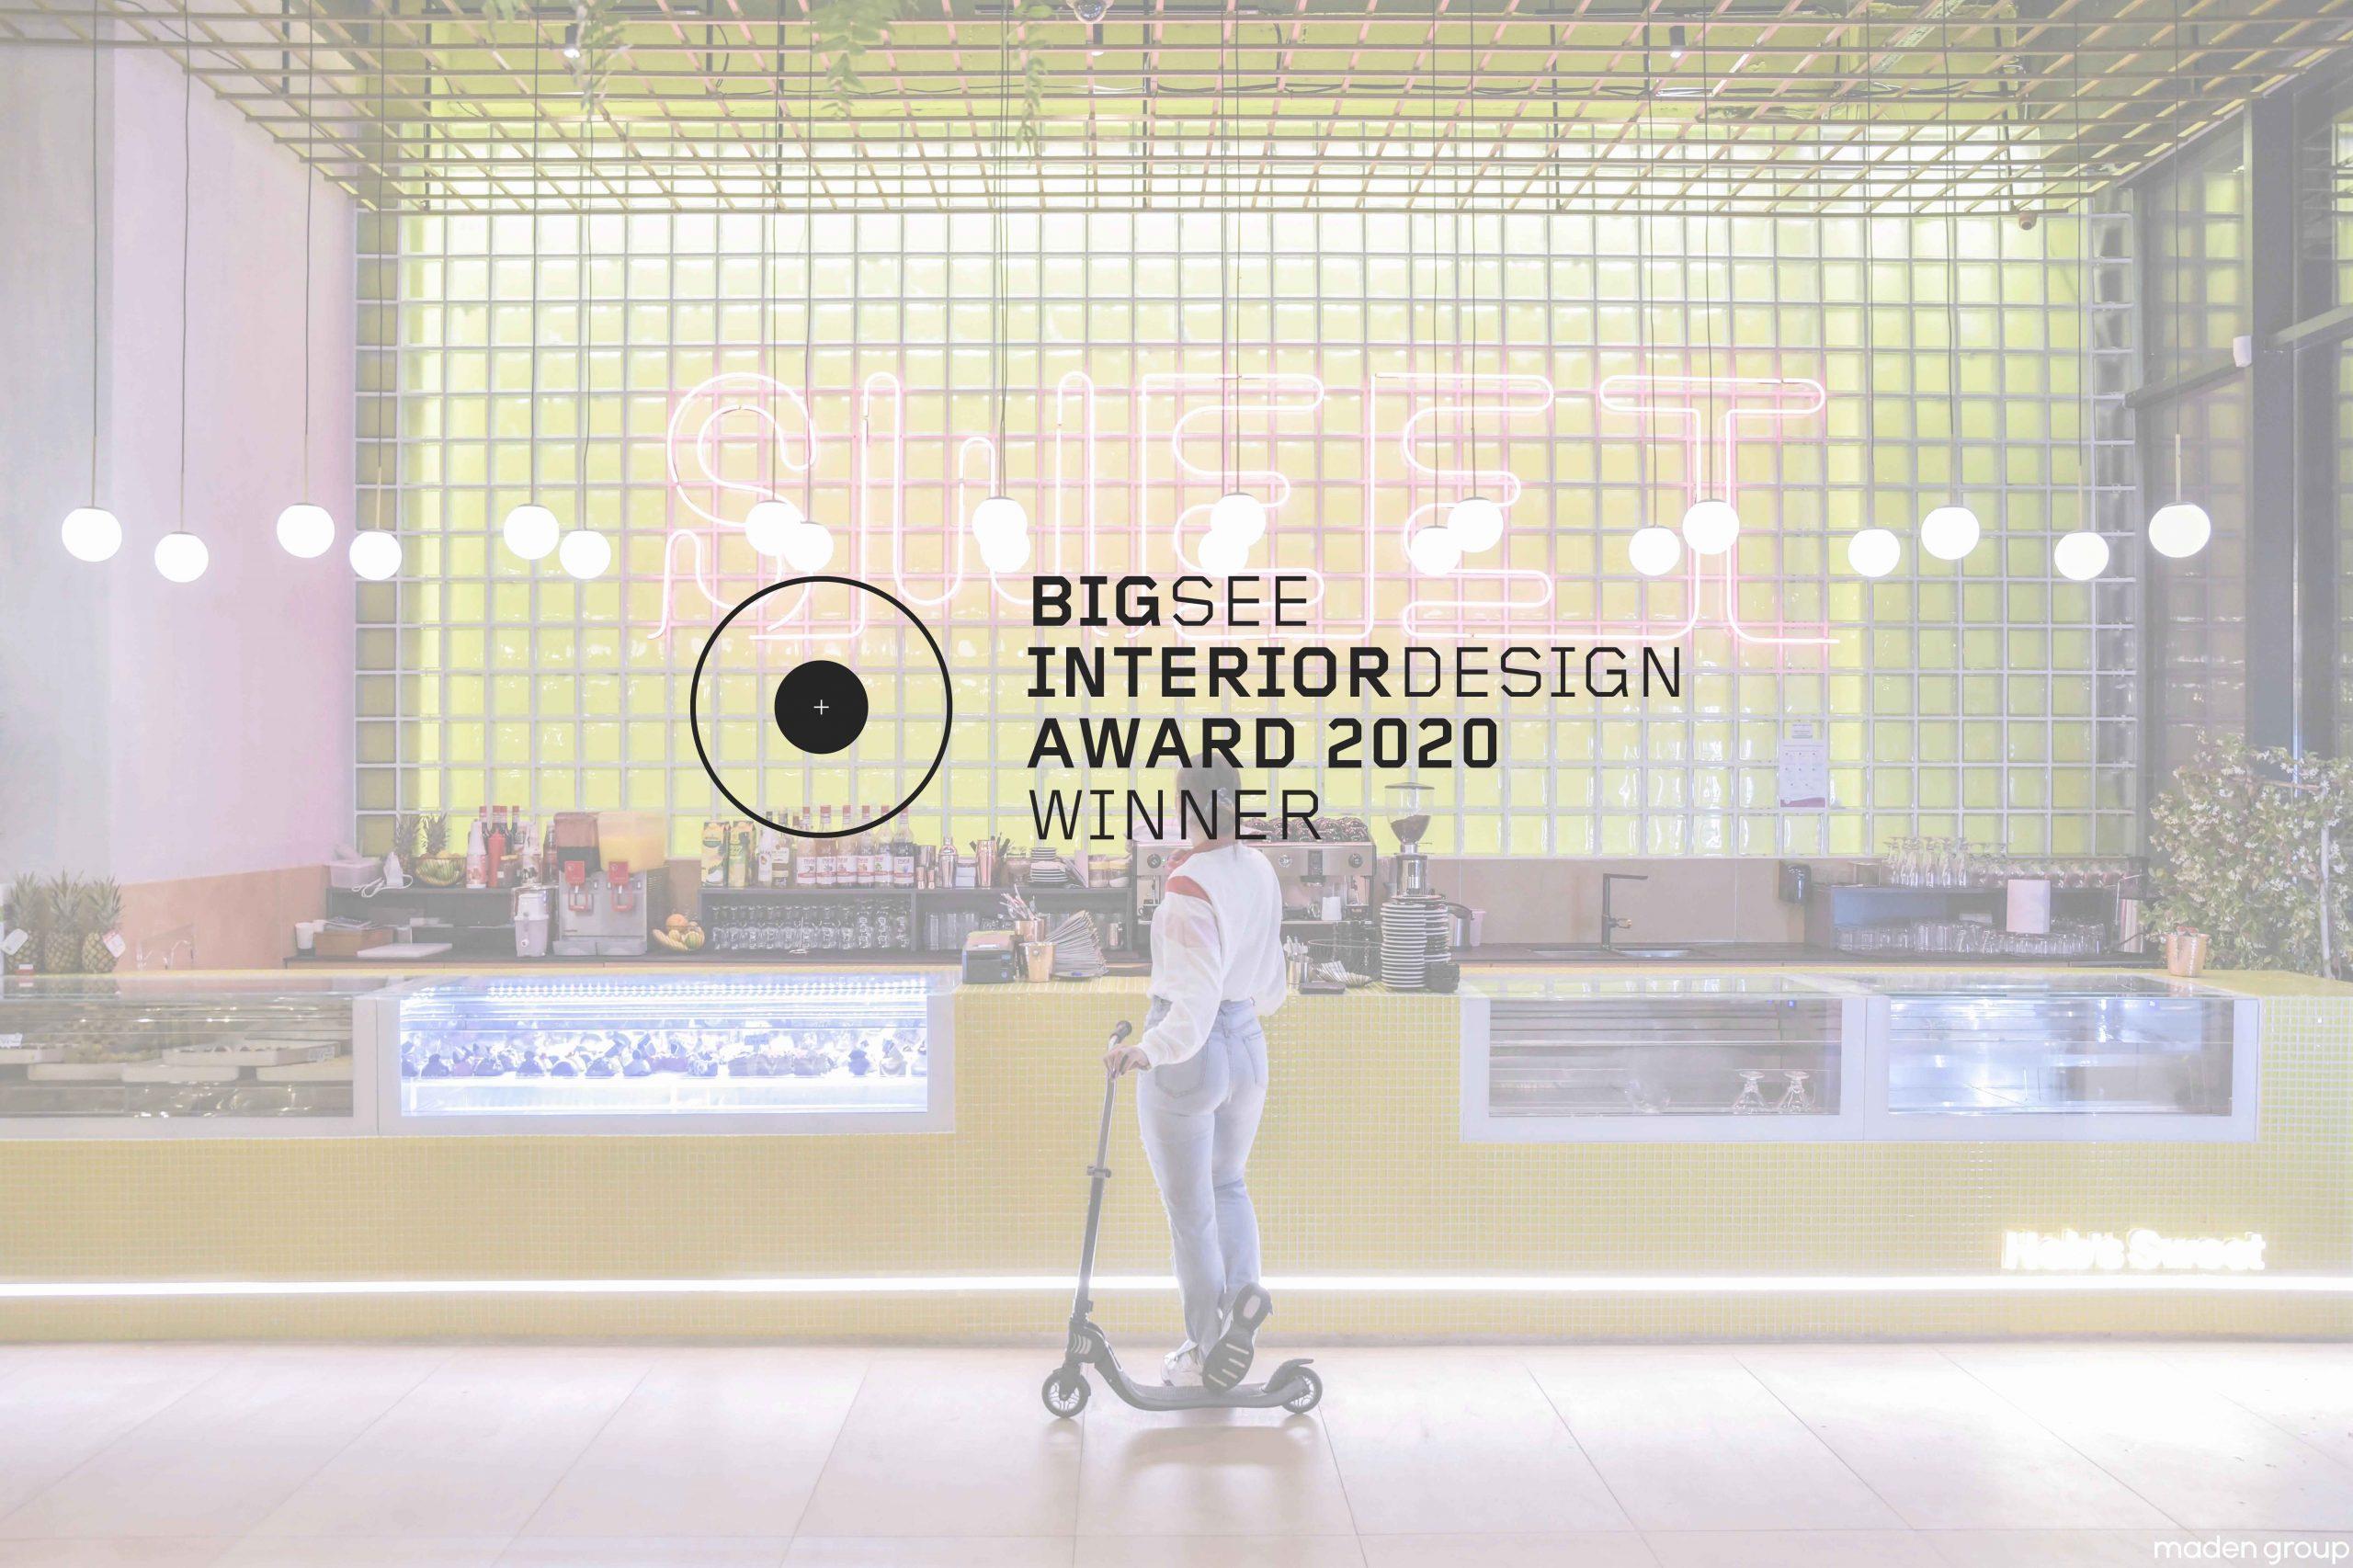 HEB'S Winner at BIG SEE Interior Design 2020